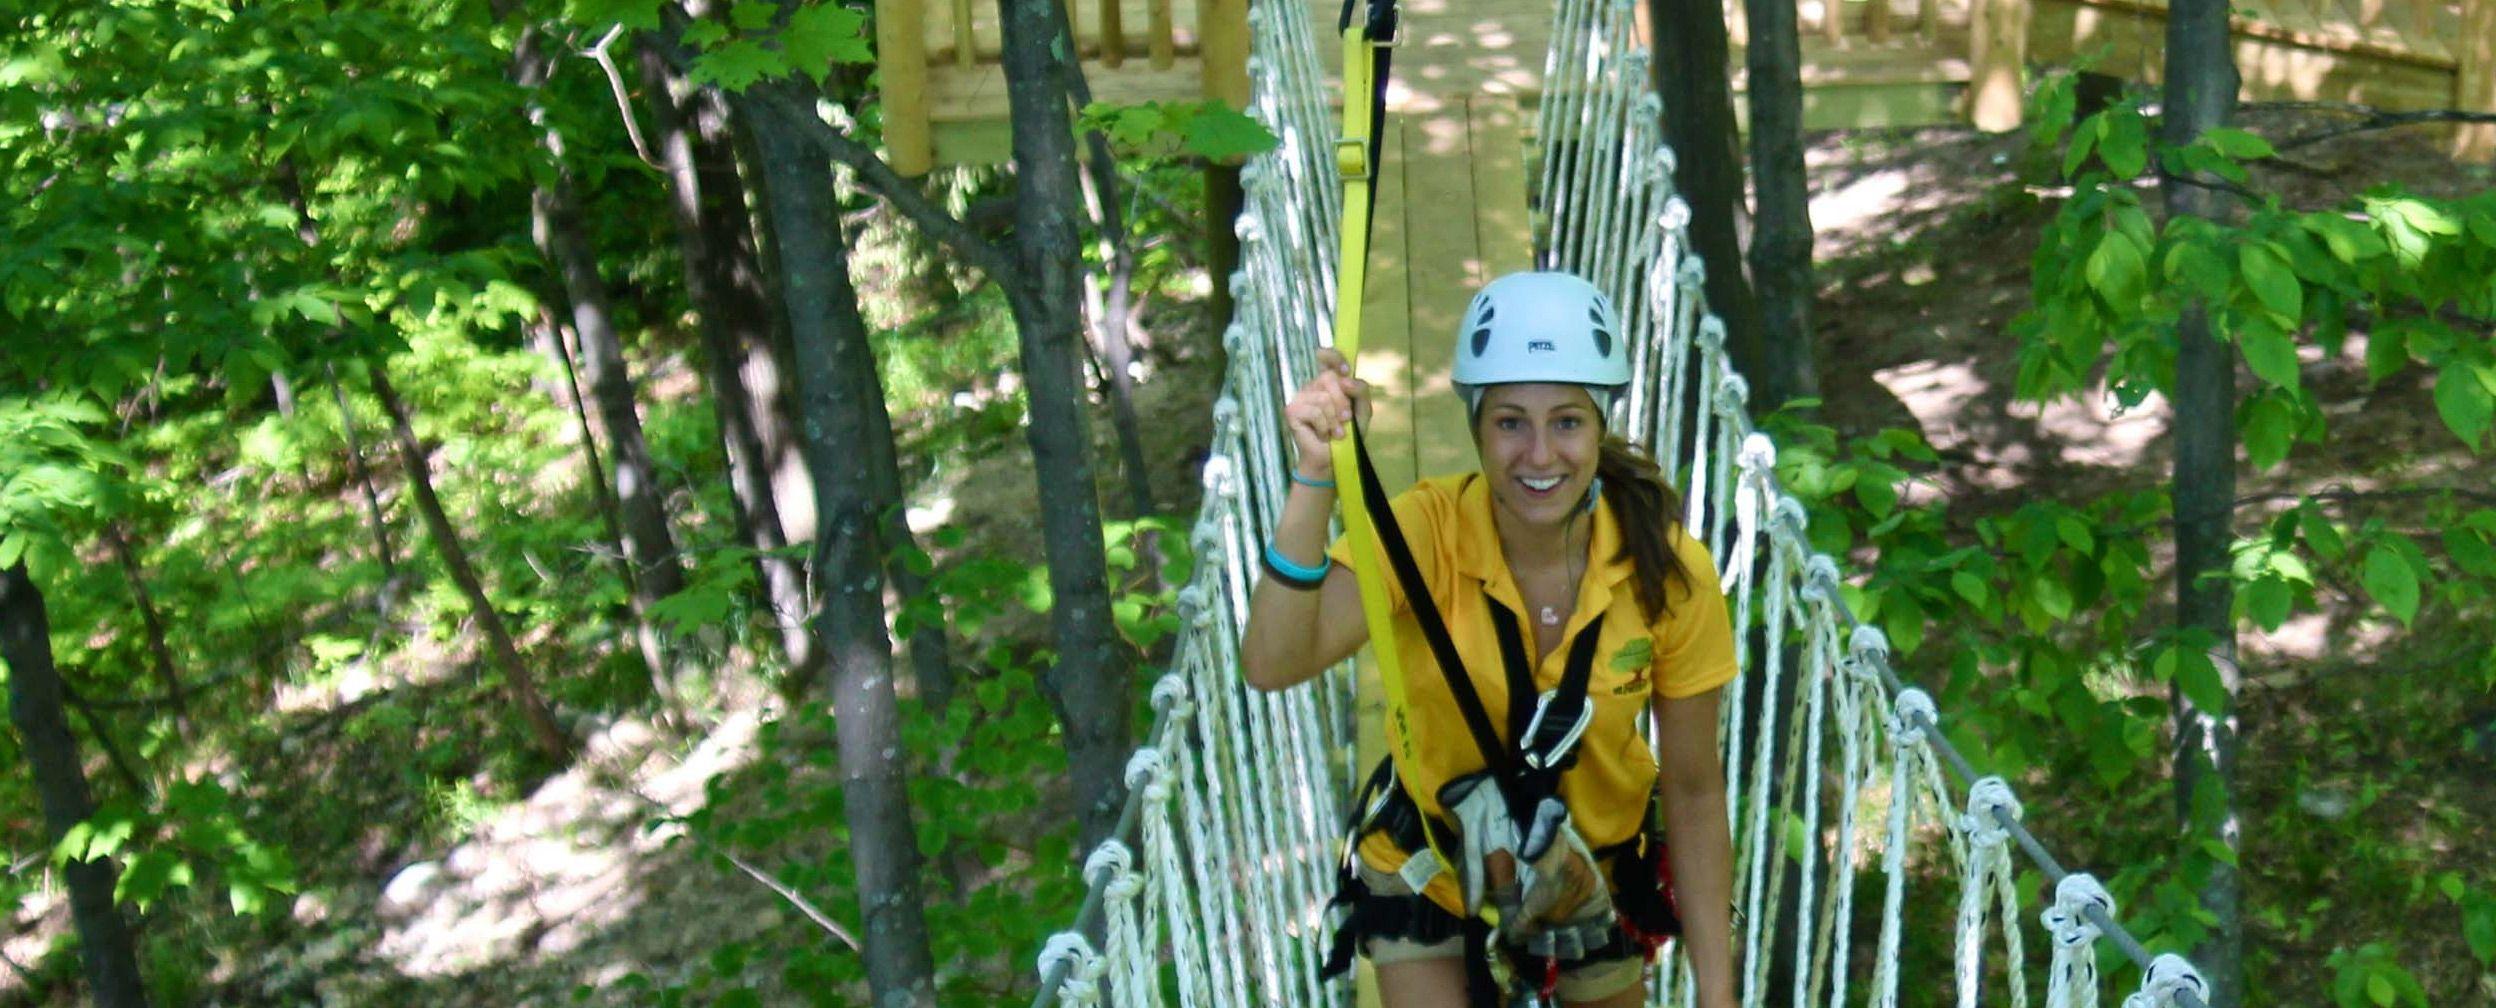 Wildwood Rush Northern Michigan Zip Line Canopy Tour Boyne City Michigan Road Trip Ziplining Northern Michigan